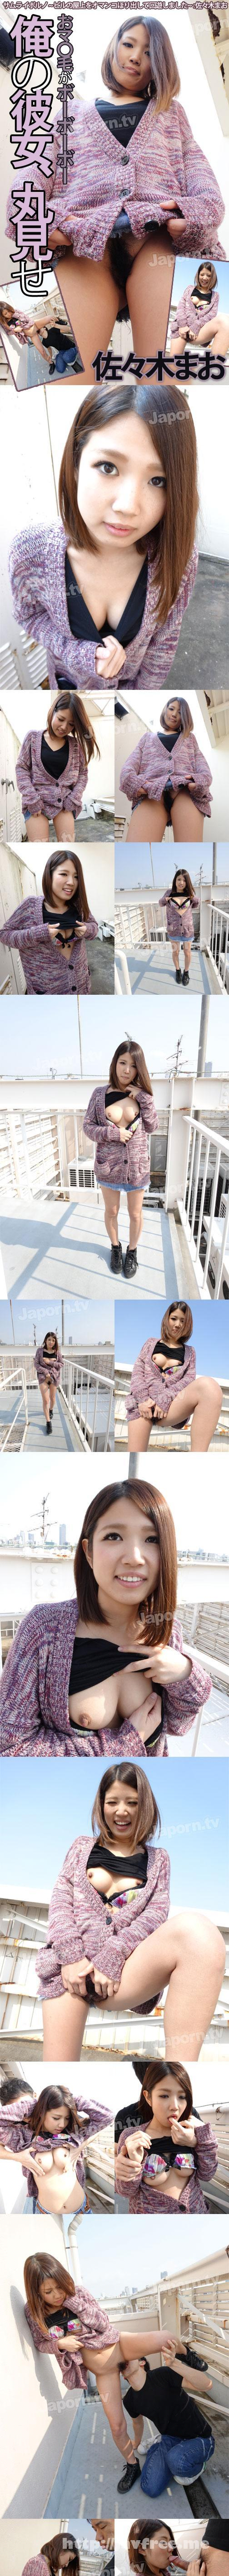 [DSAM 85] ビルの屋上をオマンコほり出して回遊しました : 佐々木まお 佐々木まお Mao Sasaki DSAM